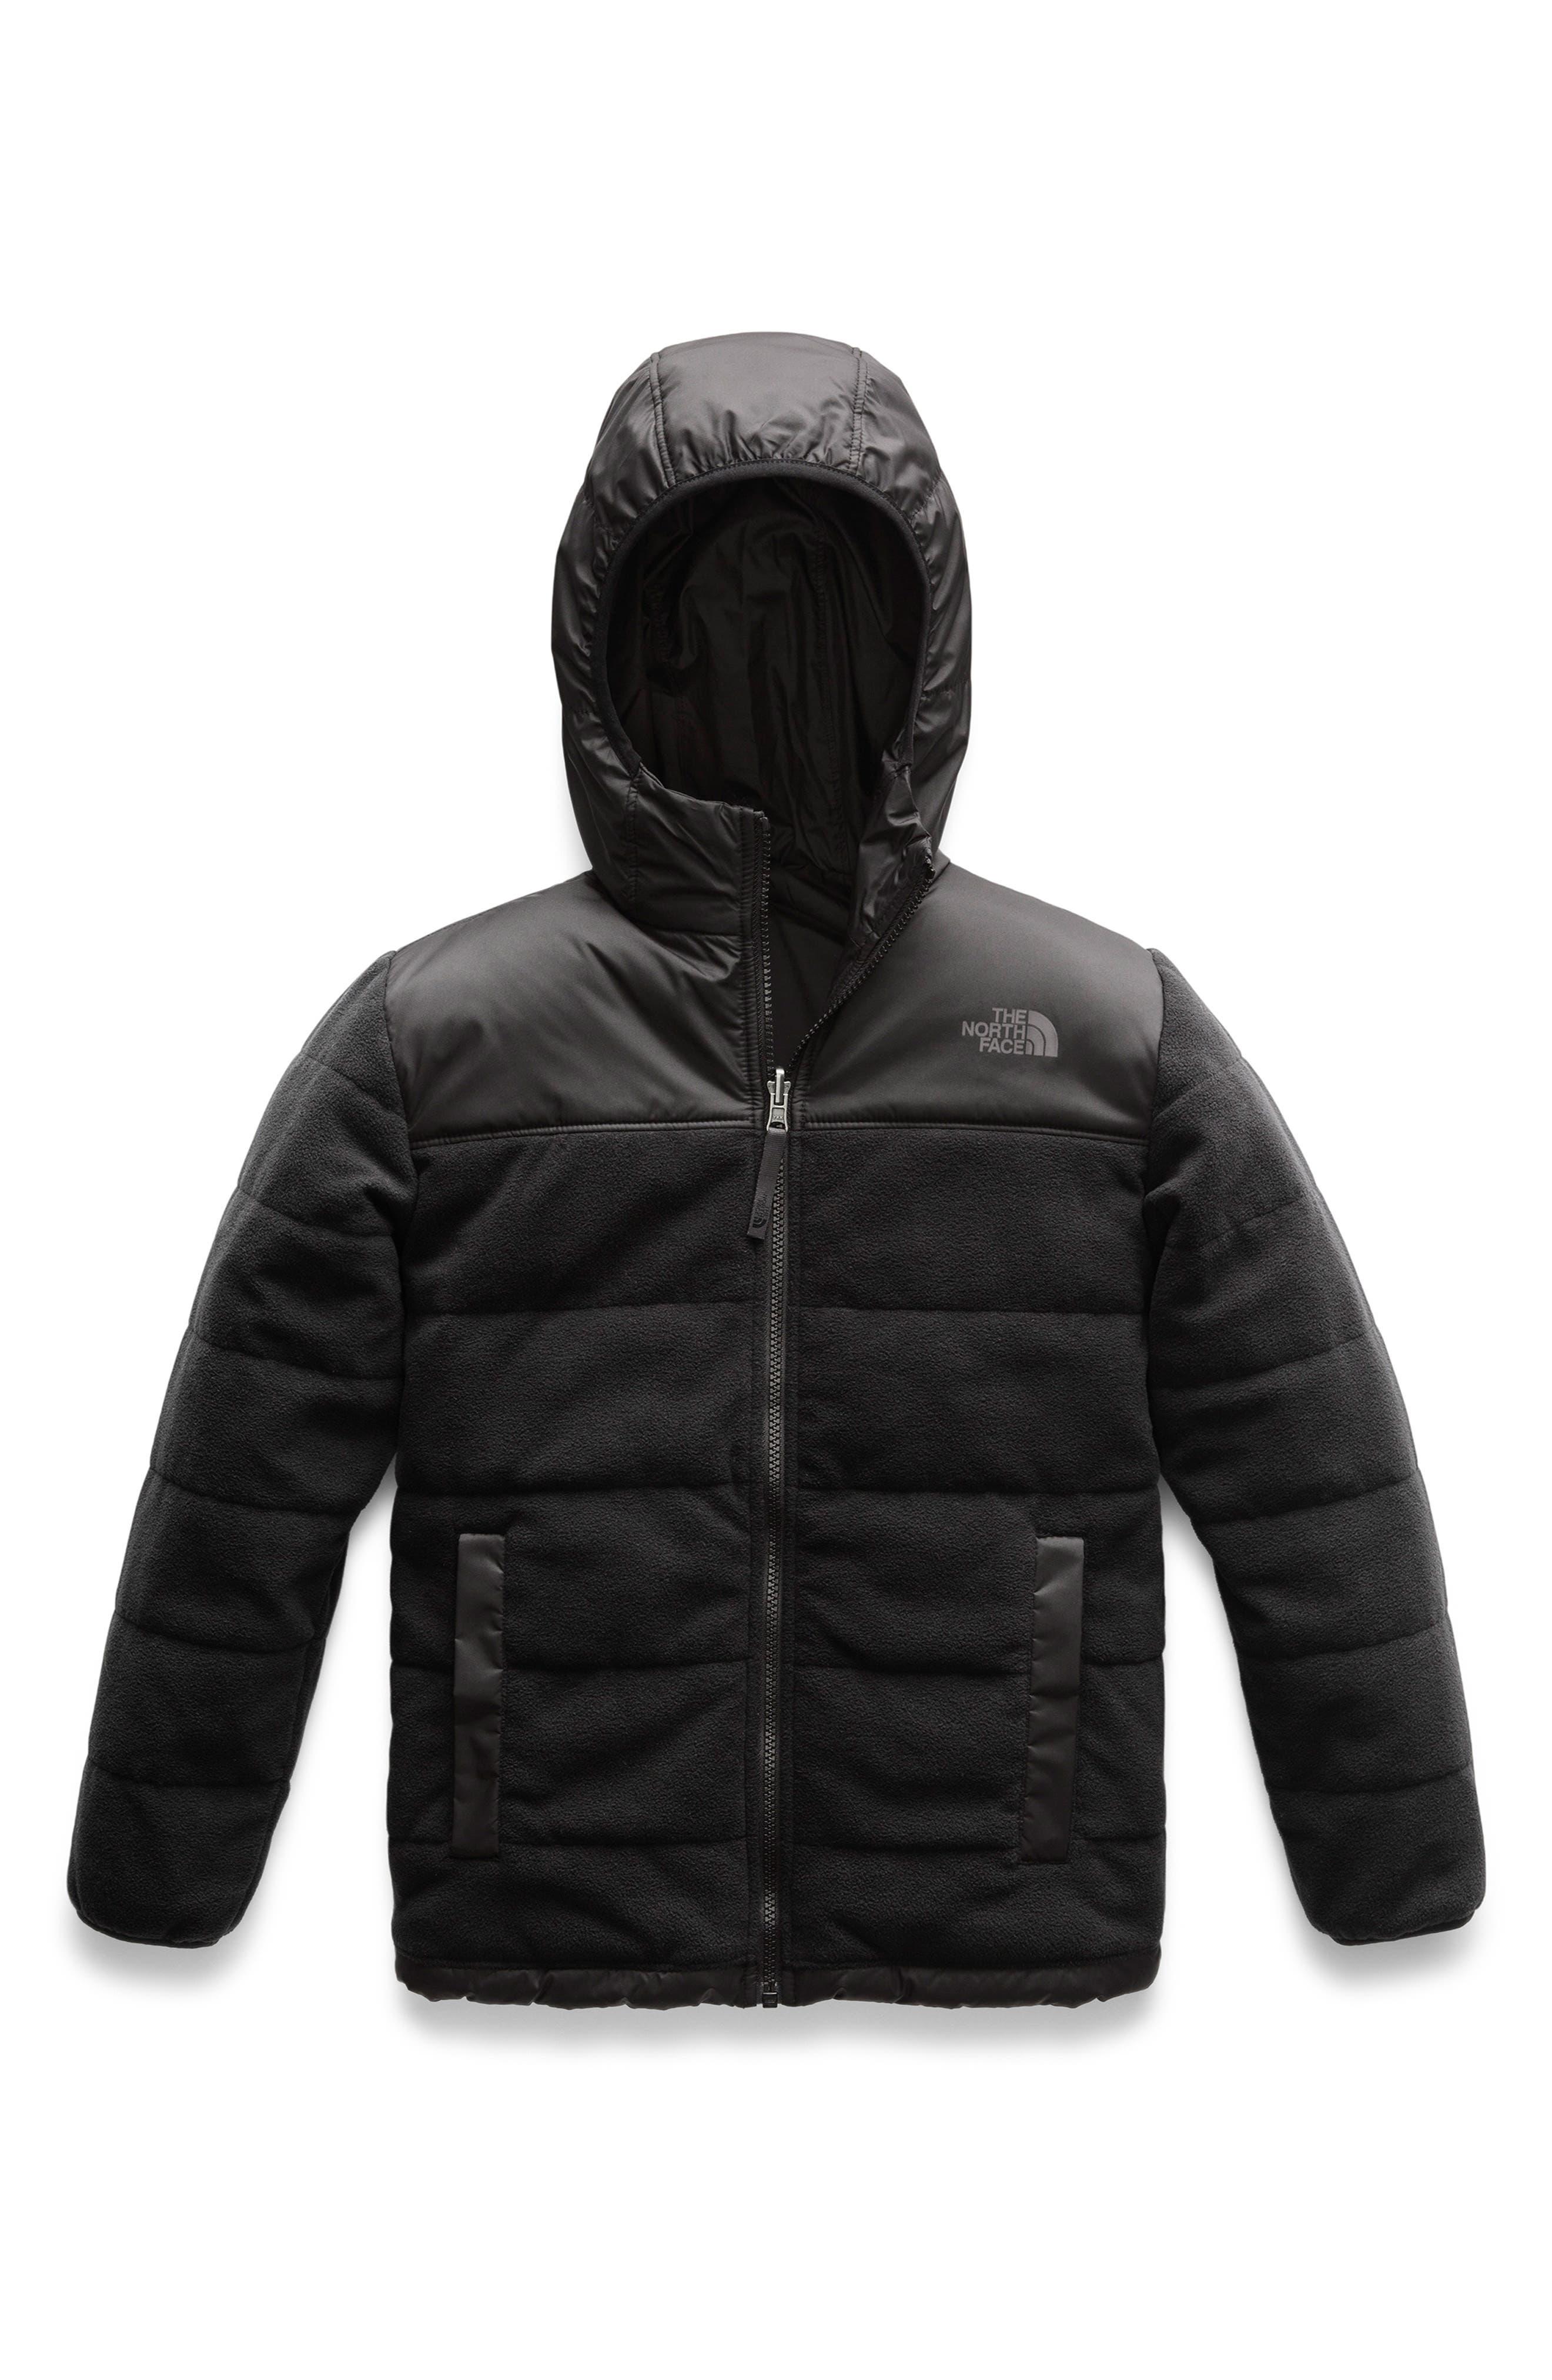 Boys The North Face True Or False Reversible Jacket Size L (1416)  Black